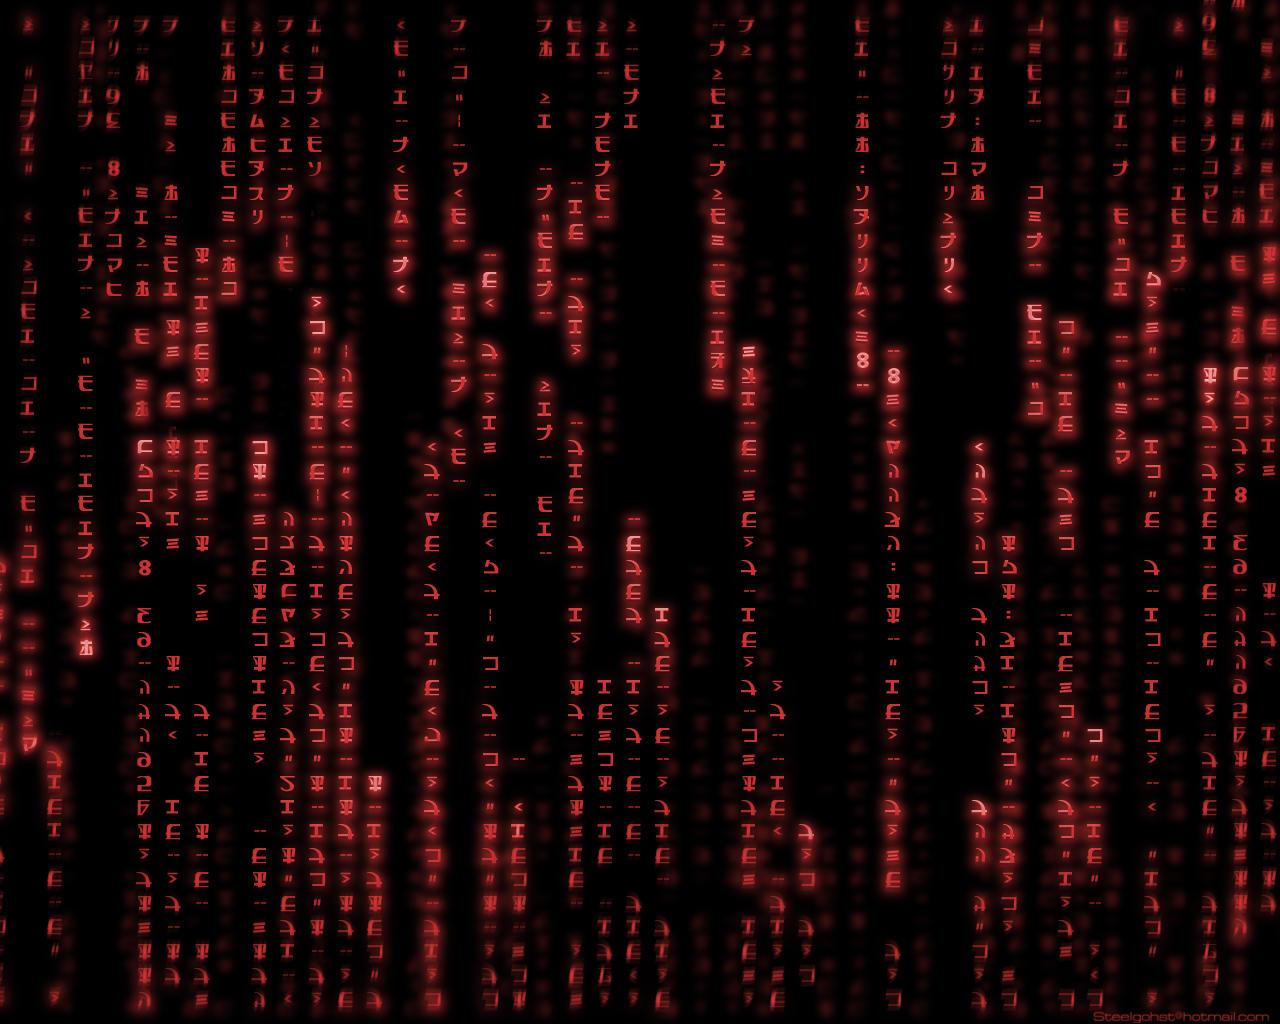 red matrix wallpaper moving - photo #2